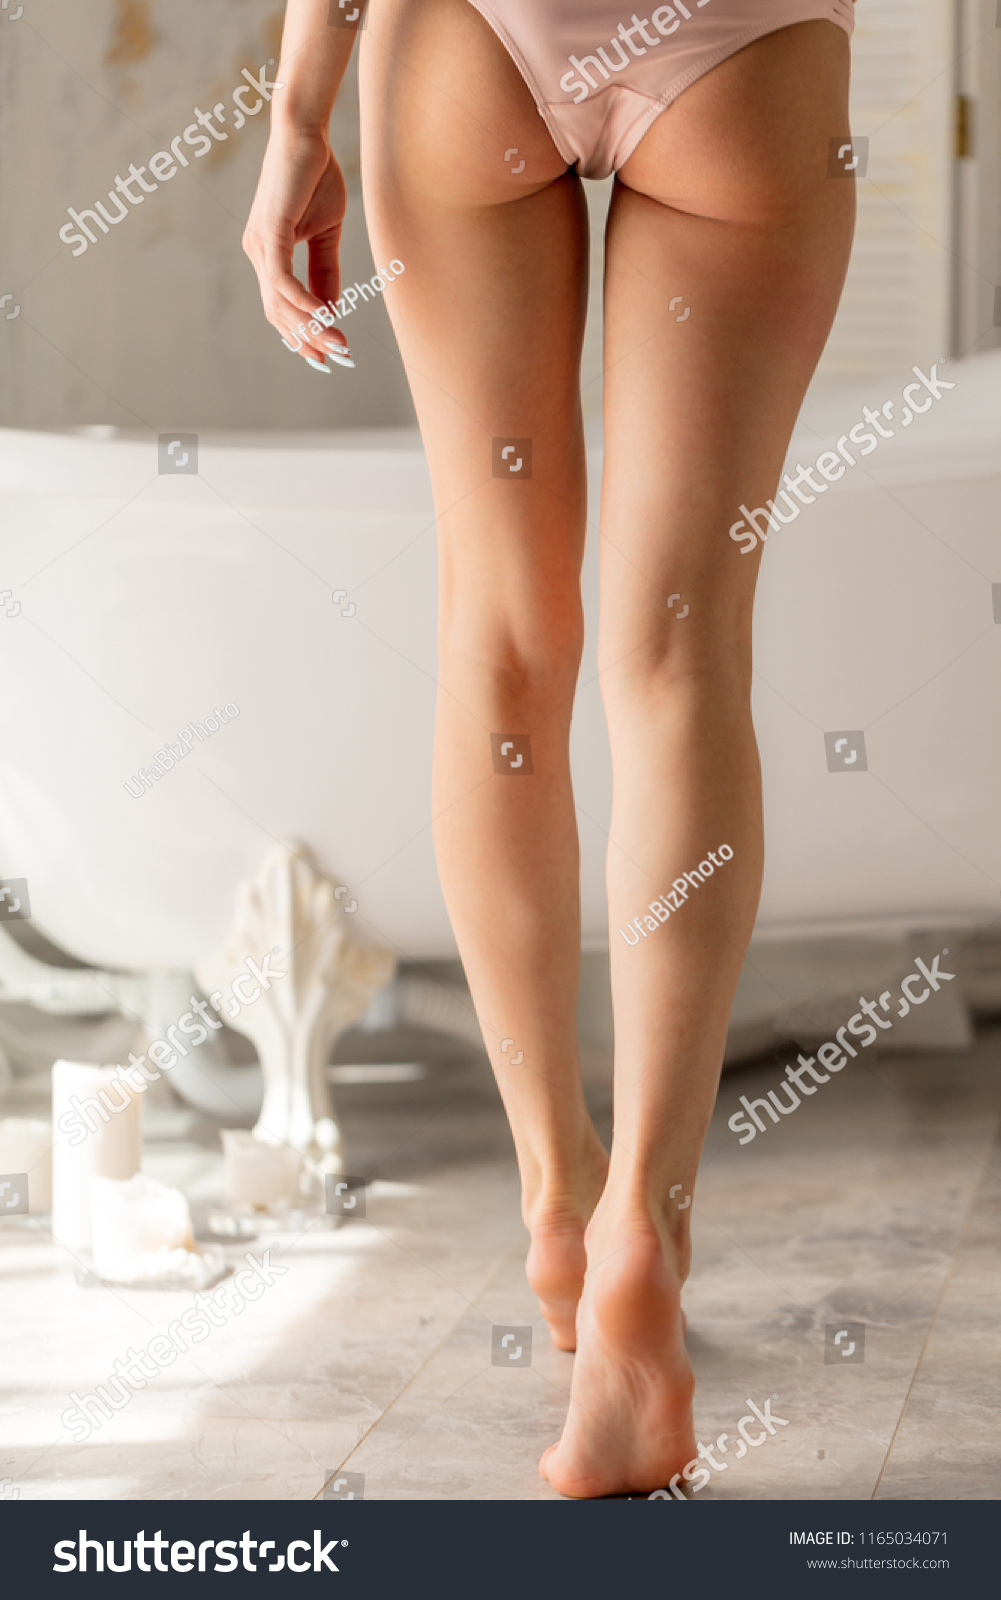 Women Log Legged Panties Jpg